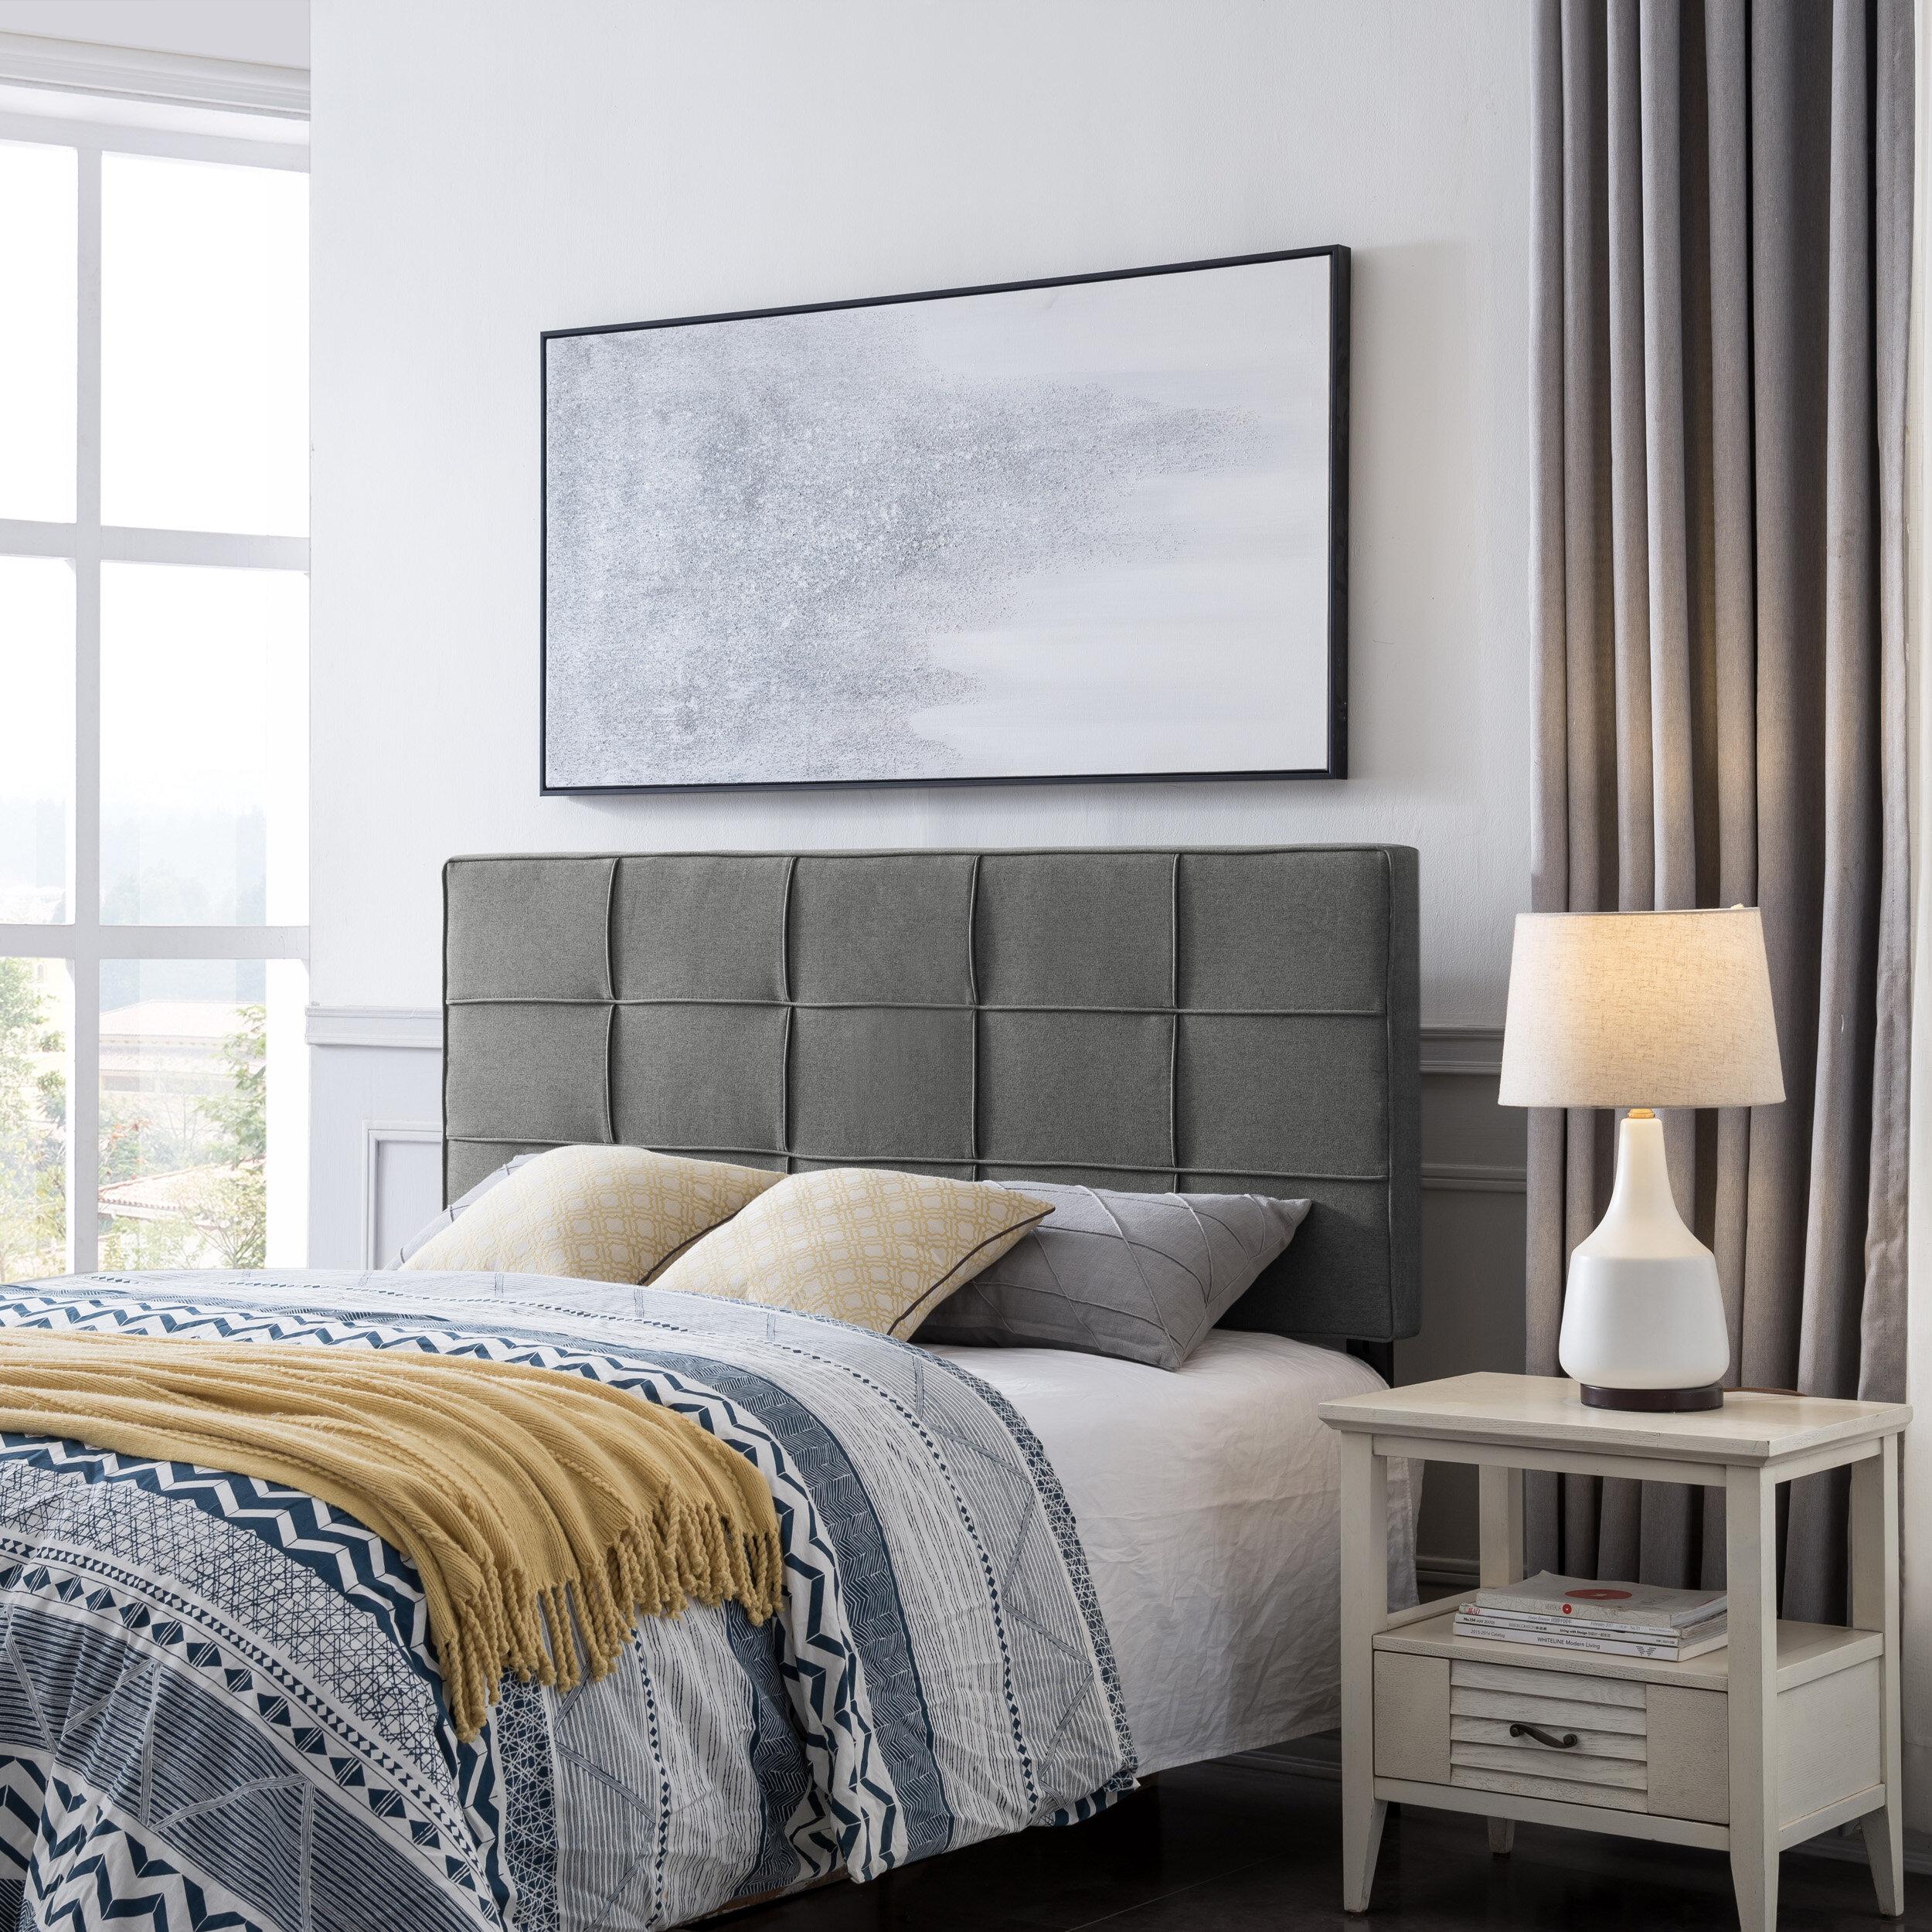 Wall Mount Modular Upholstered Headboard Tiles Button Tufted Gray Full//Queen